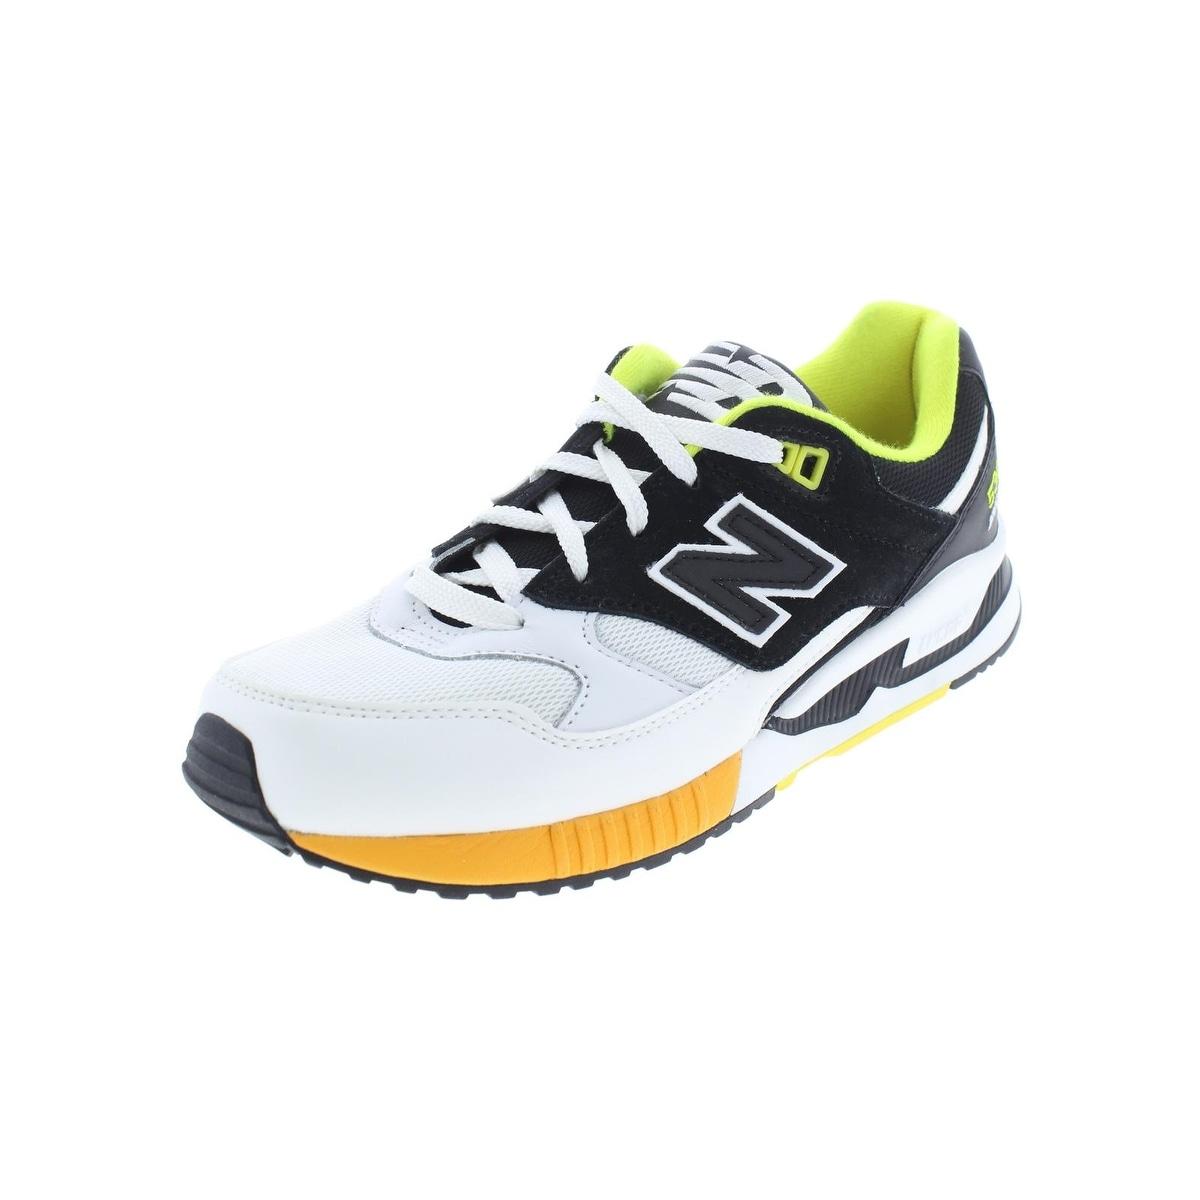 personal Ceniza Destierro  Shop New Balance Womens 530 Encap Athletic Shoes Leather Trim Classic -  Overstock - 24104303